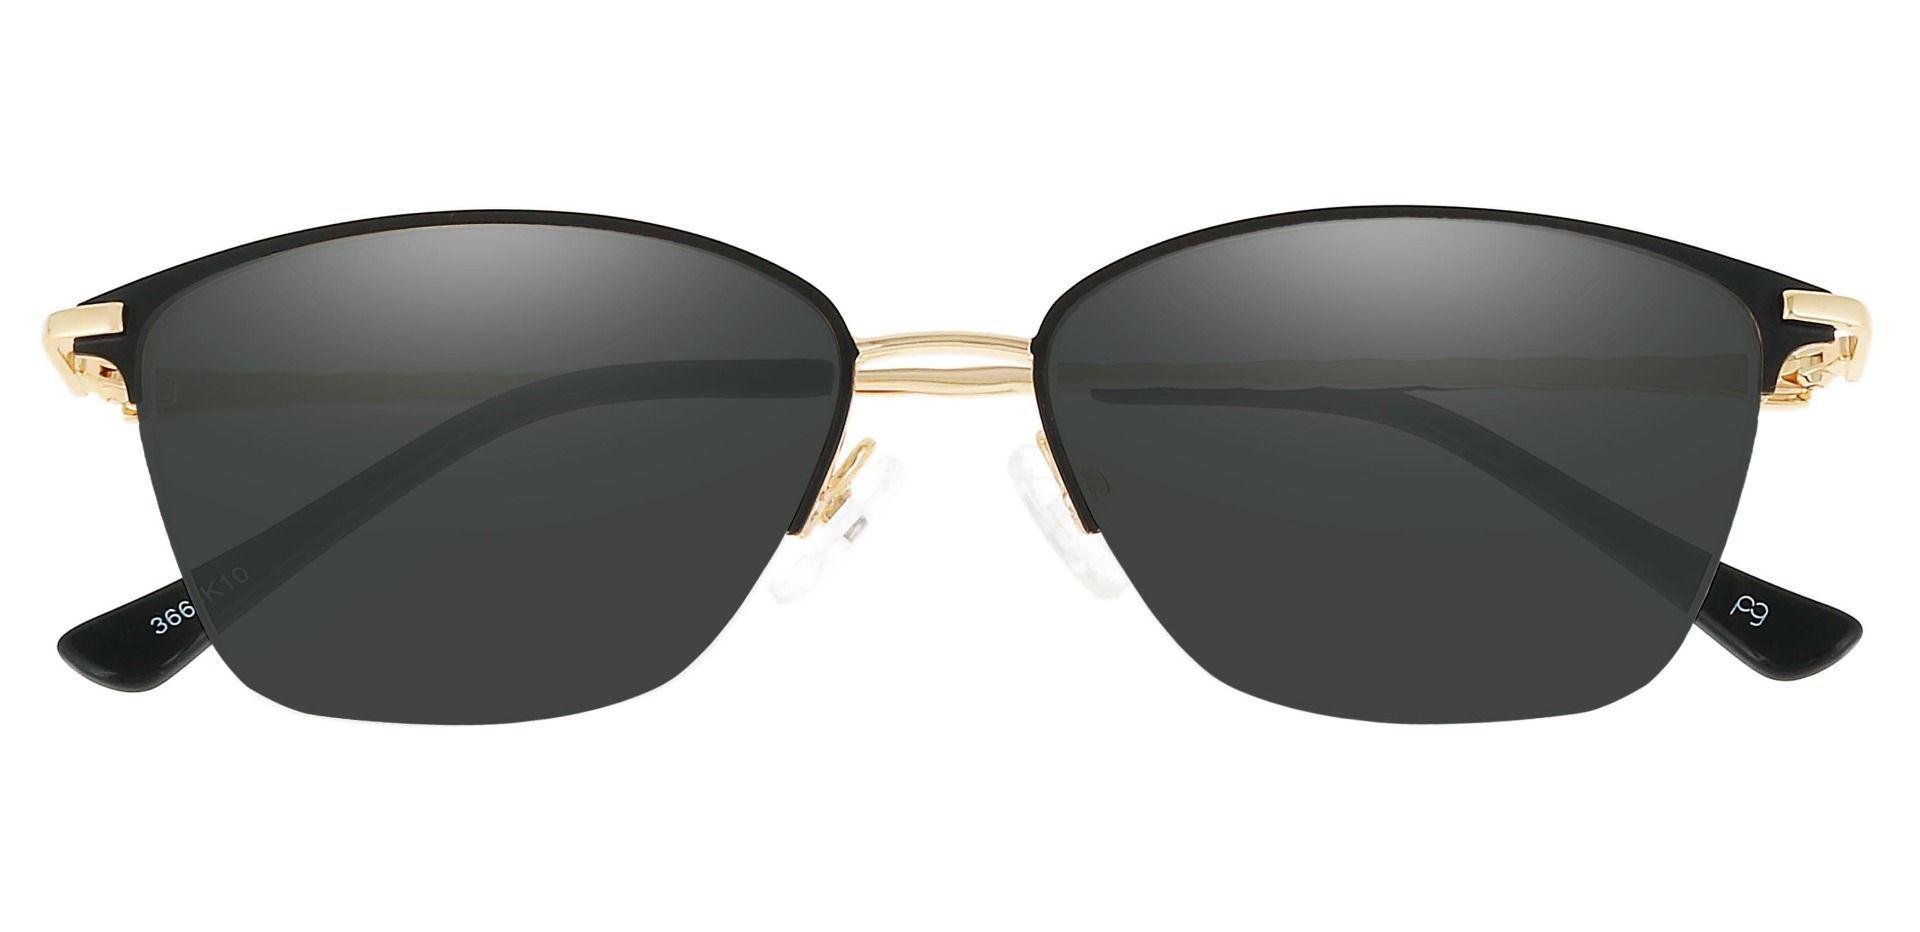 Marigold Rectangle Prescription Sunglasses - Black Frame With Gray Lenses